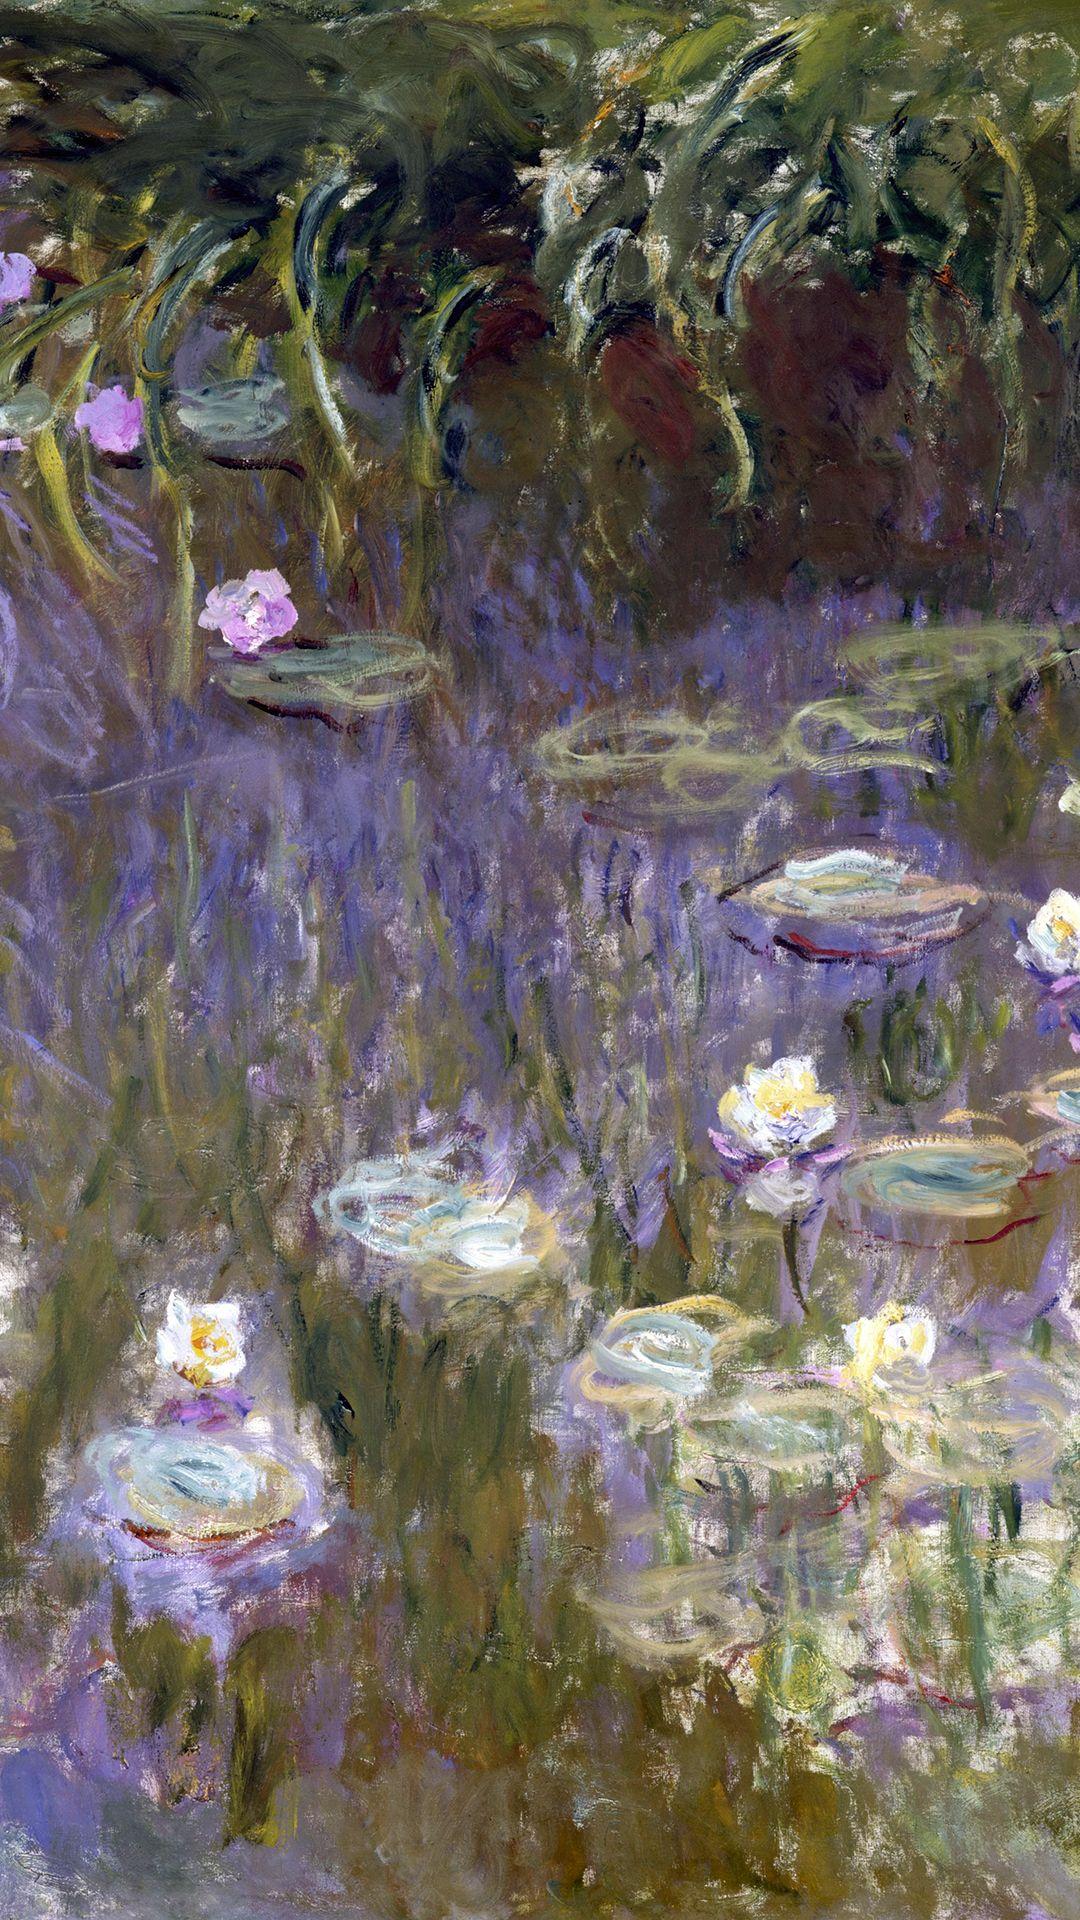 Claude Water Lilies 1992 (1922) Detail